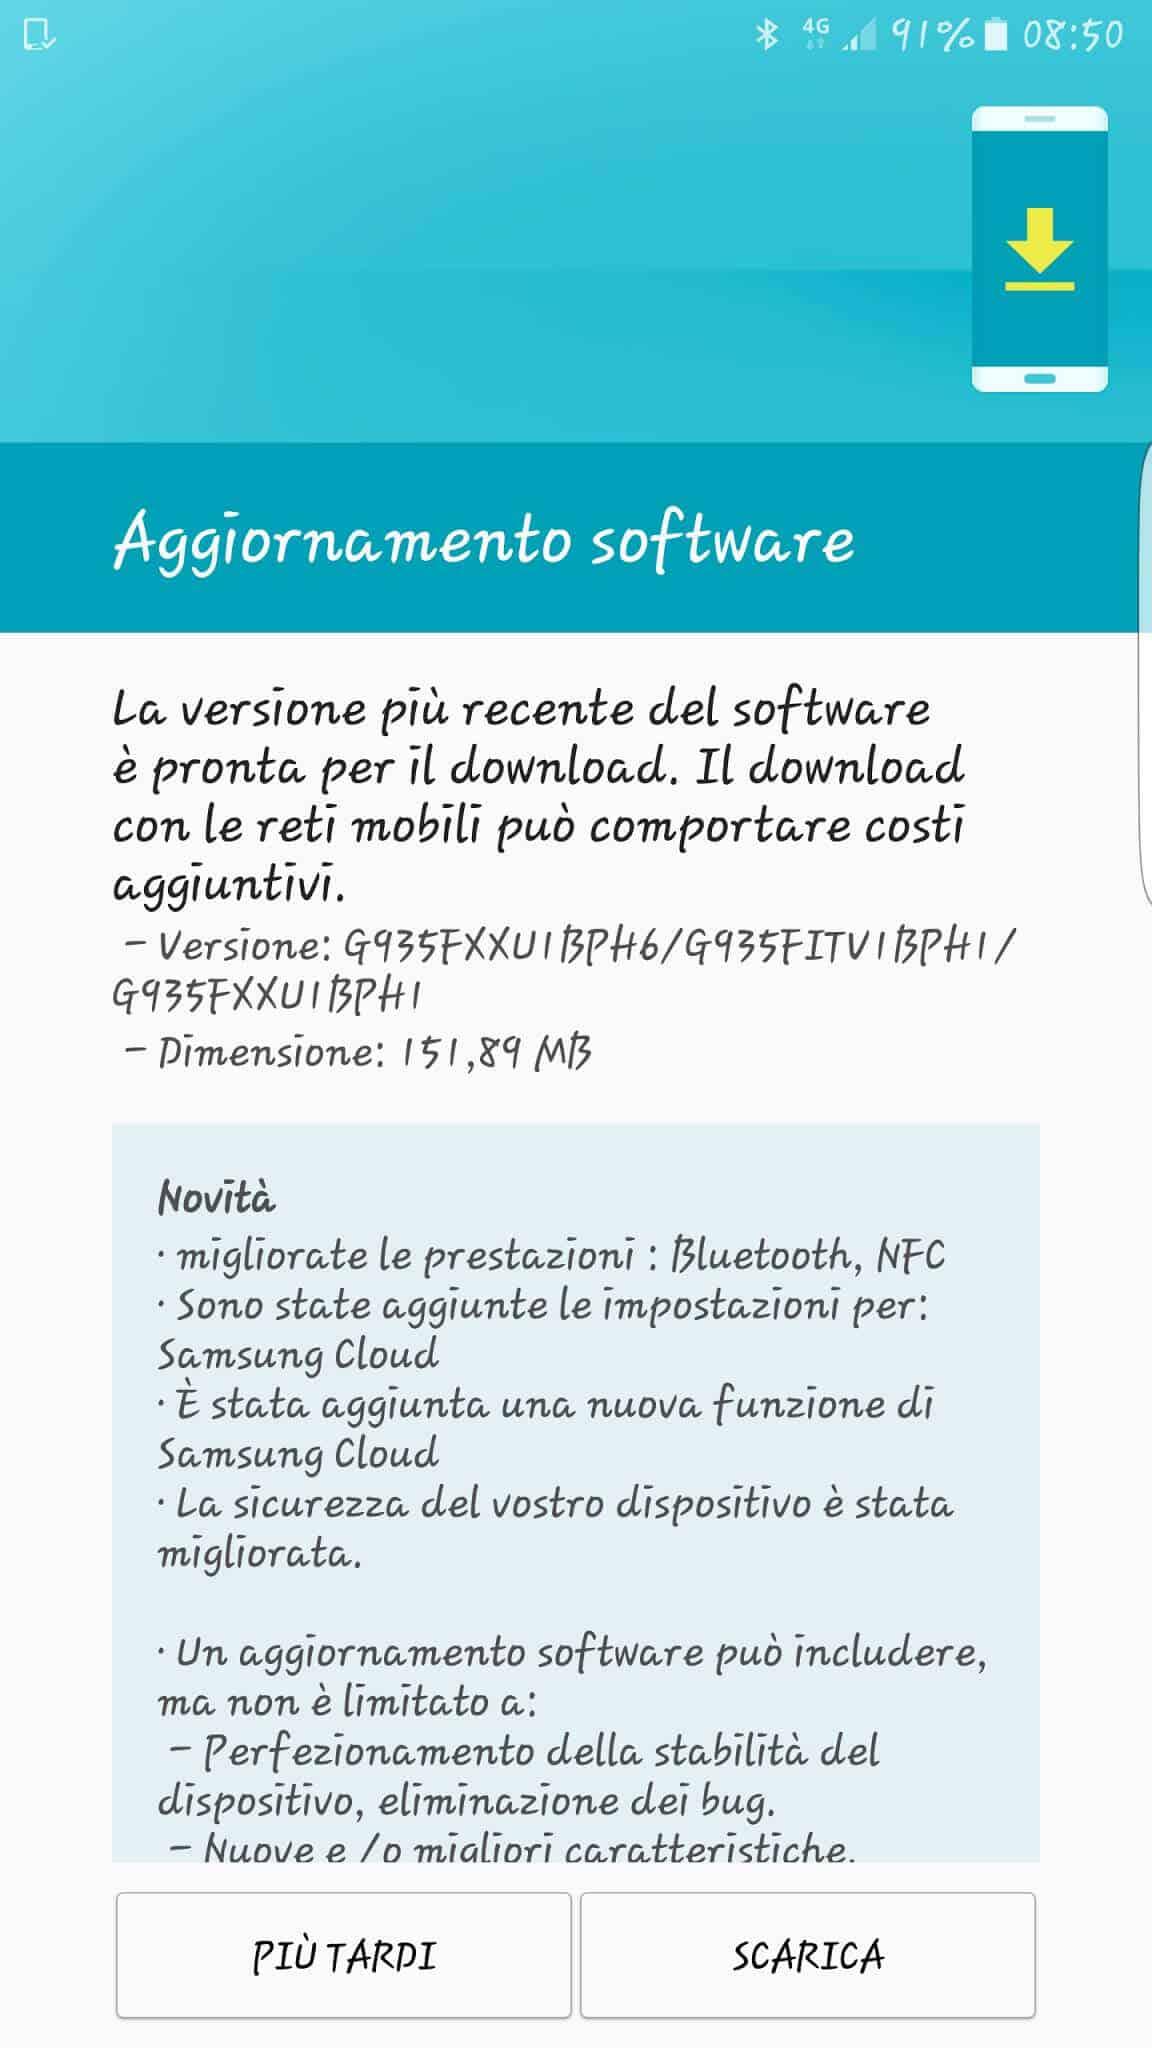 Galaxy S7 S7 Edge August 2016 Security Update Italy KK